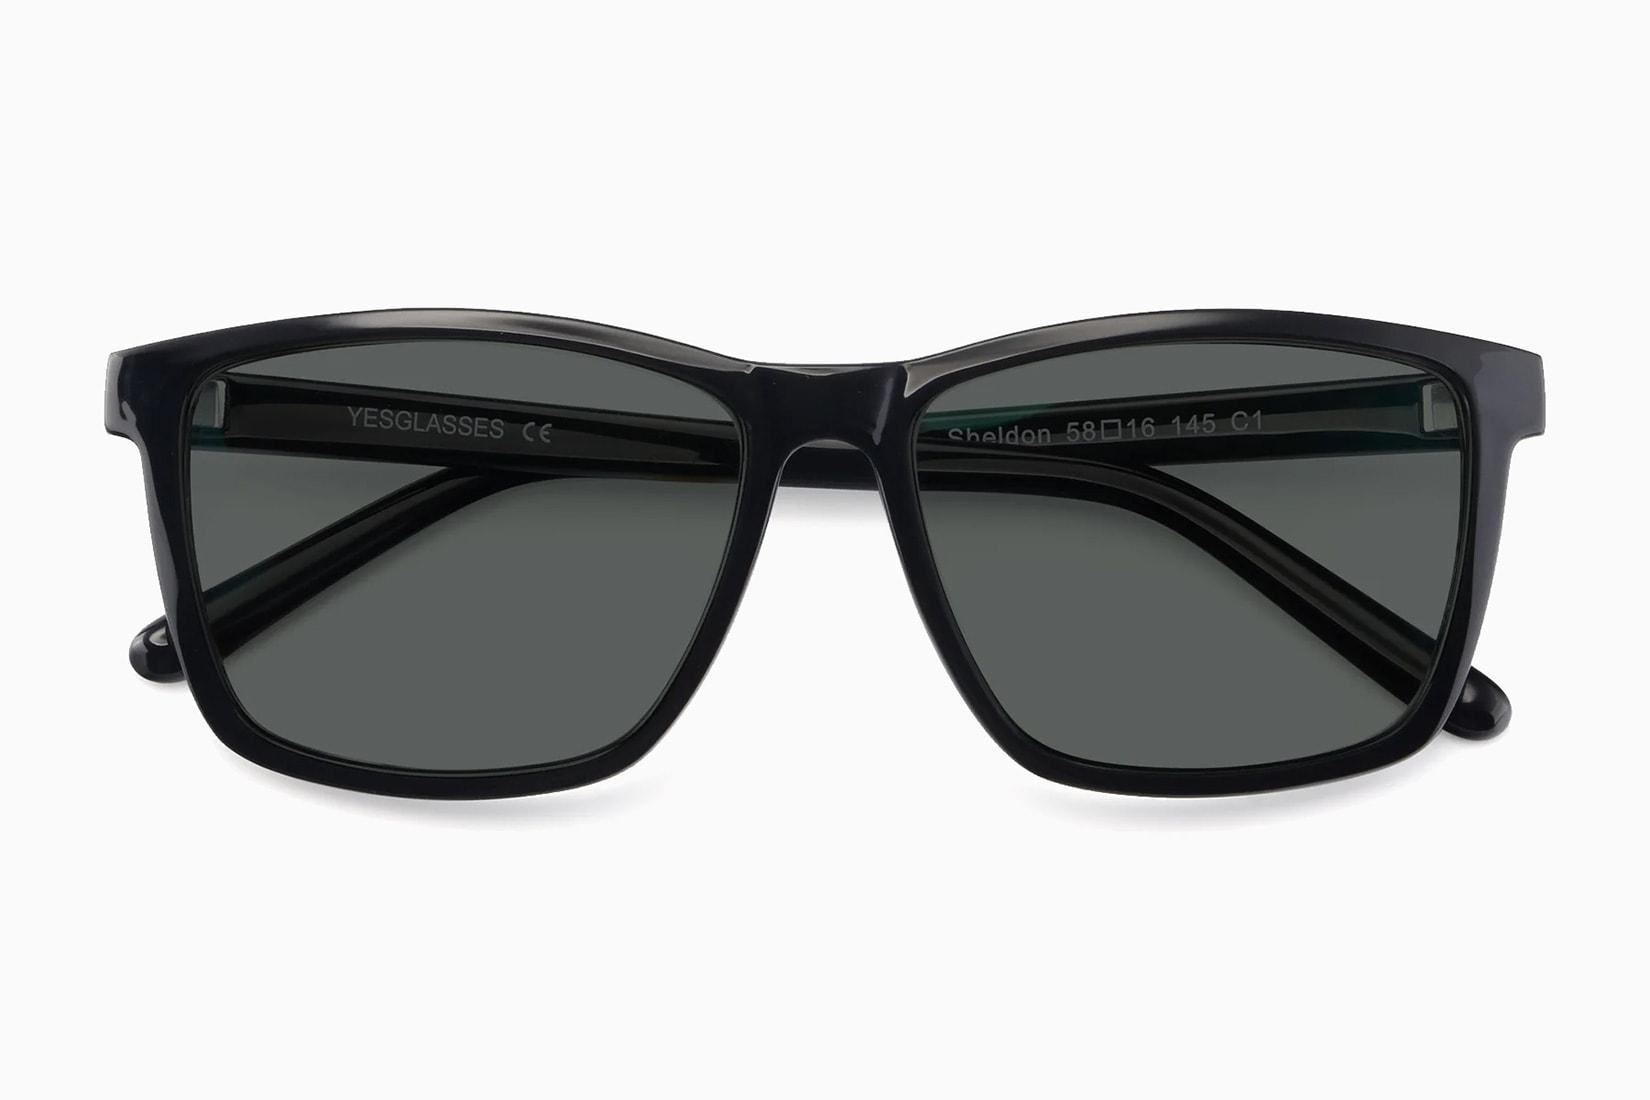 best value men sunglasses Yesglasses review - Luxe Digital